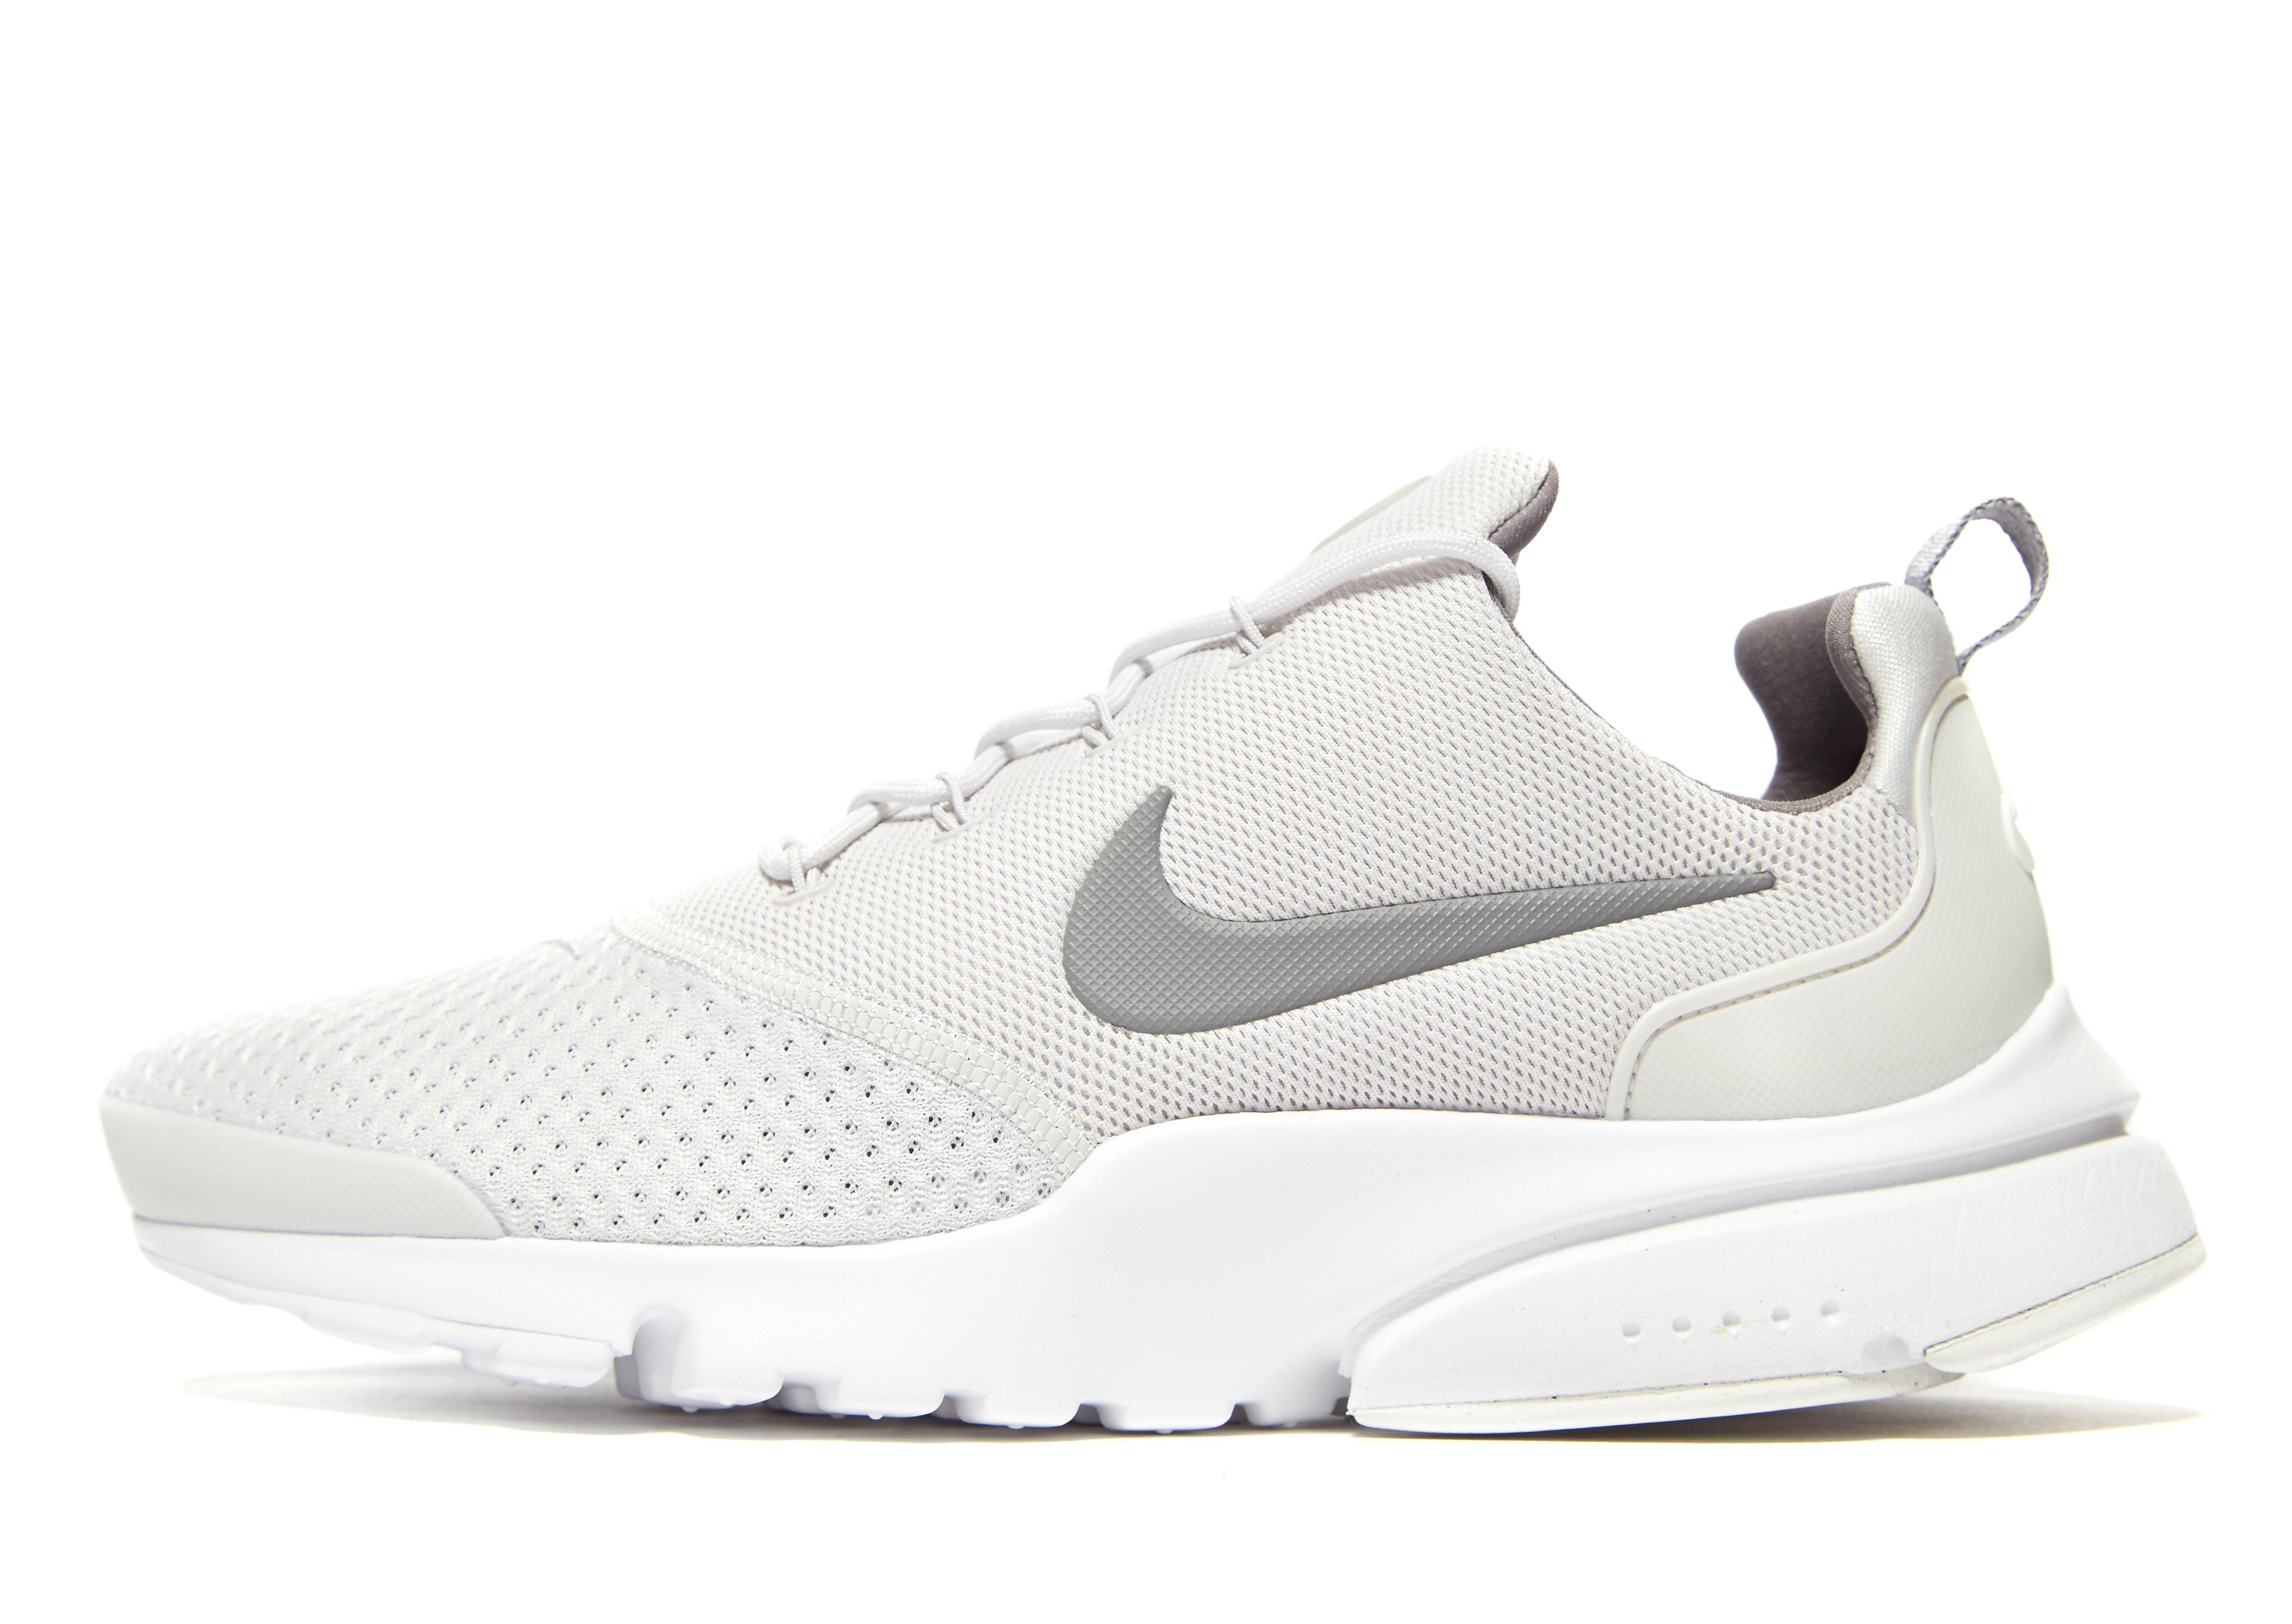 Nike Air Presto Fly SE - Only at JD - Grey/White - Mens, Grey/White